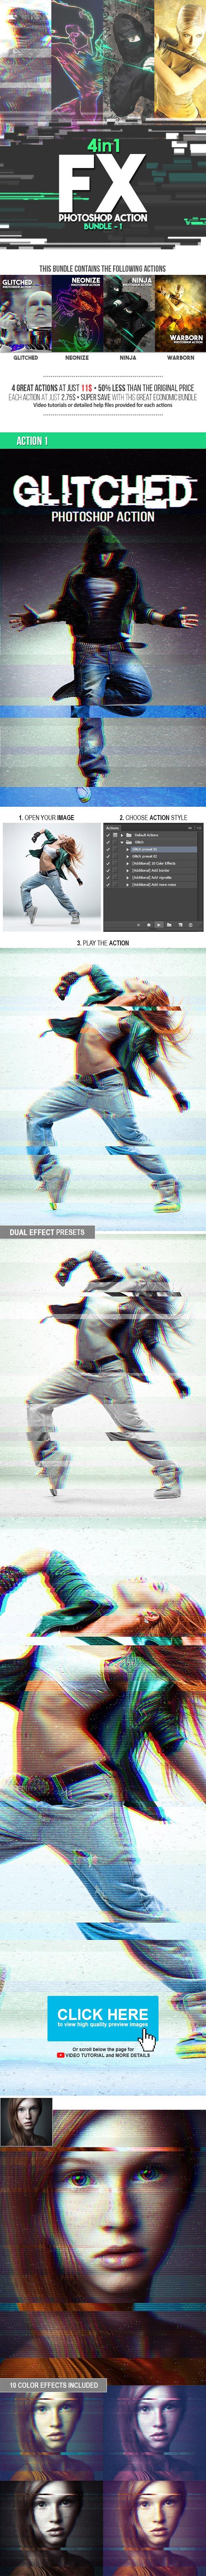 FX Photoshop Action Bundle v1 - Photo Effects Actions